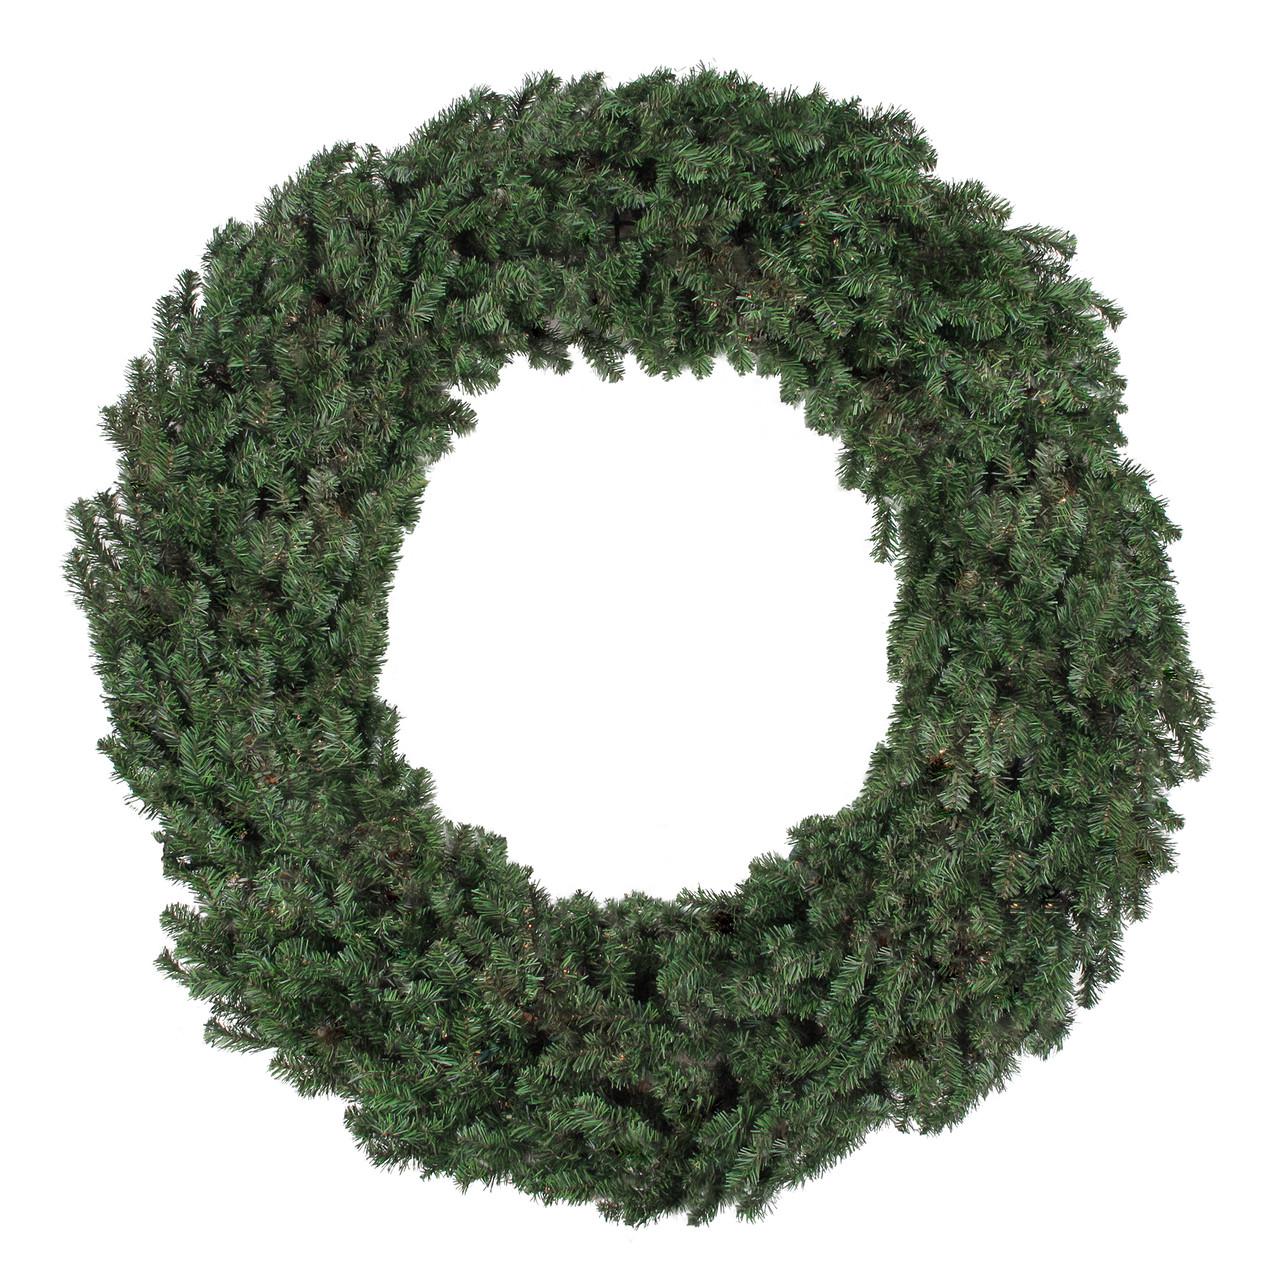 6\' Commercial Size Canadian Pine Artificial Christmas Wreath - Unlit ...